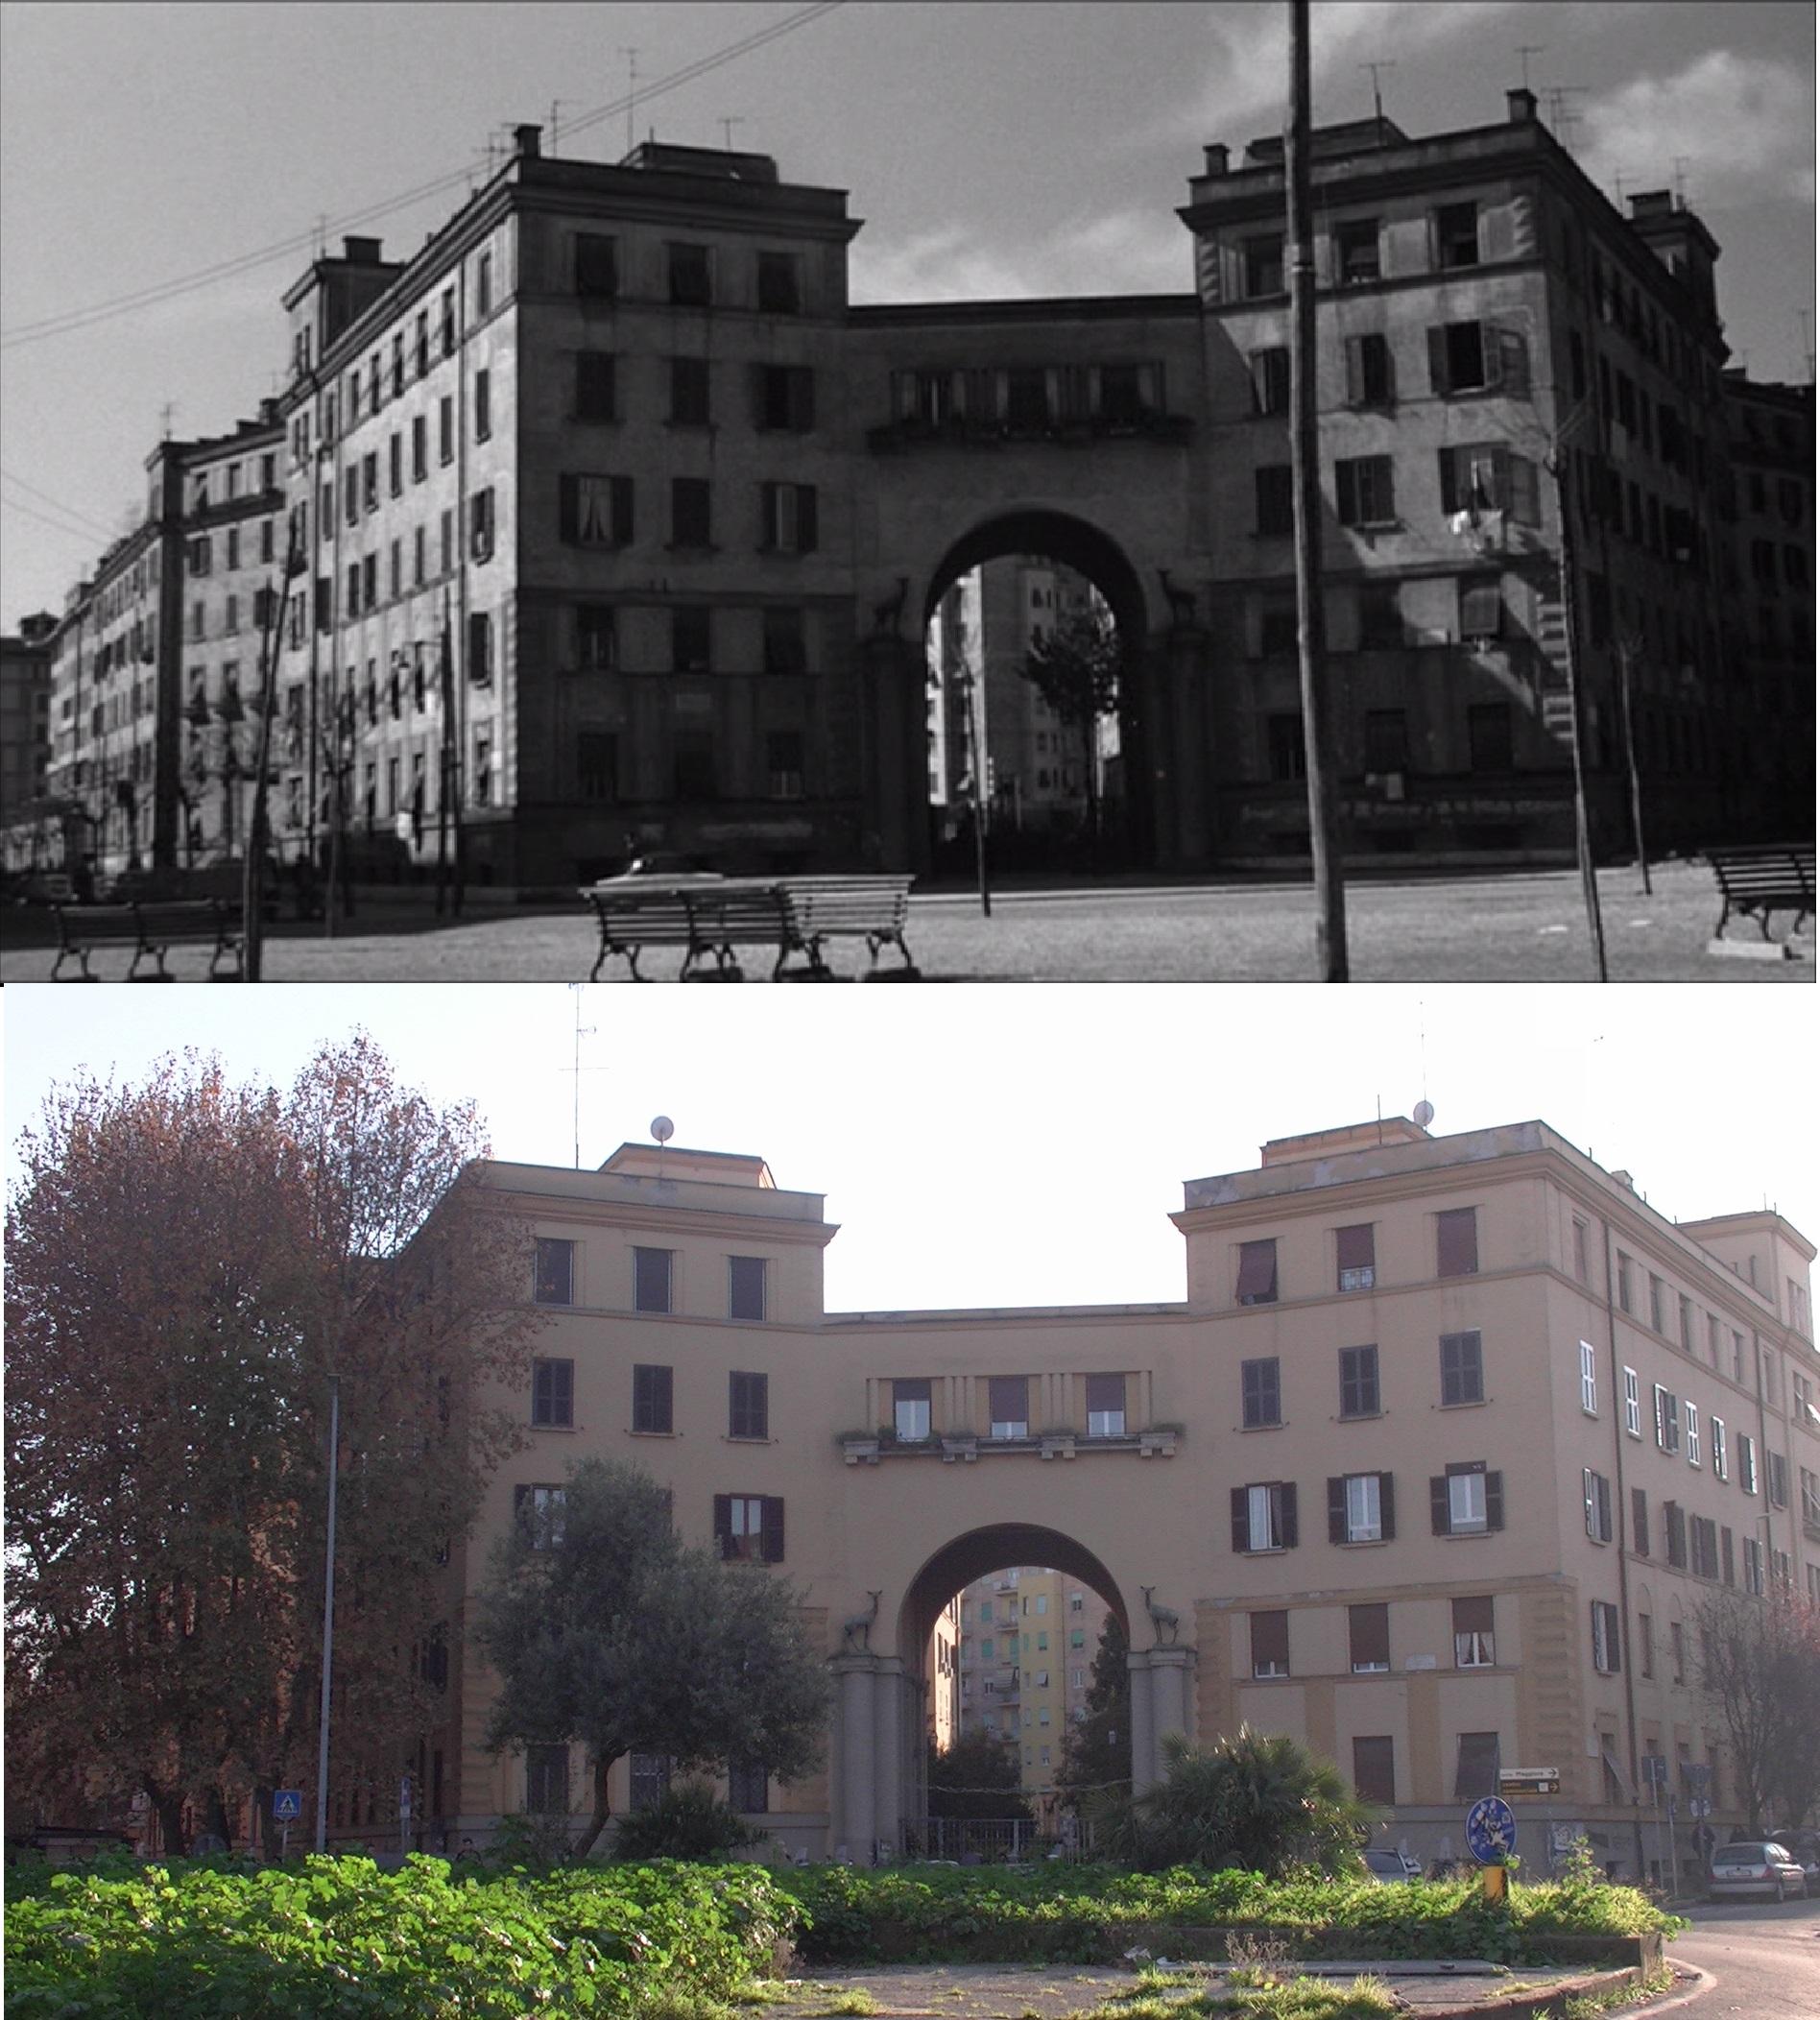 Casal Bertone - ex Palazzo dell'ente Ferrovie